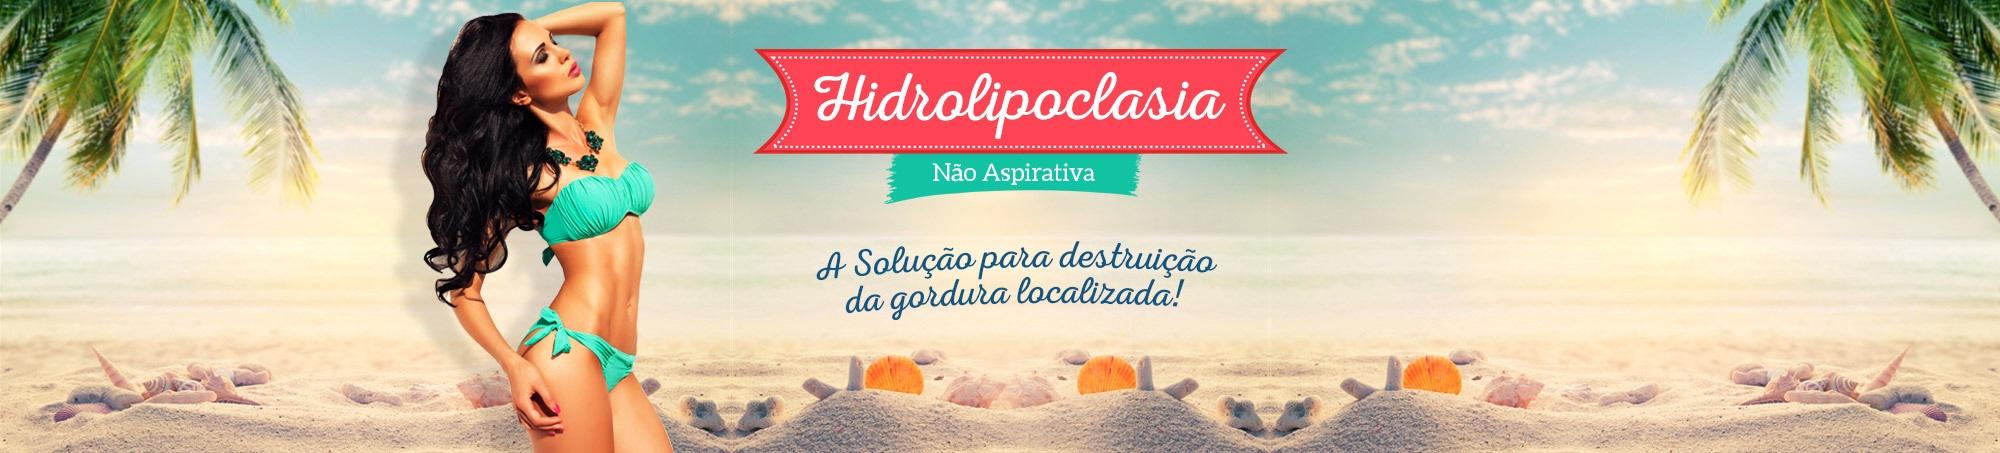 Hidrolipoclasia-Fisest-site